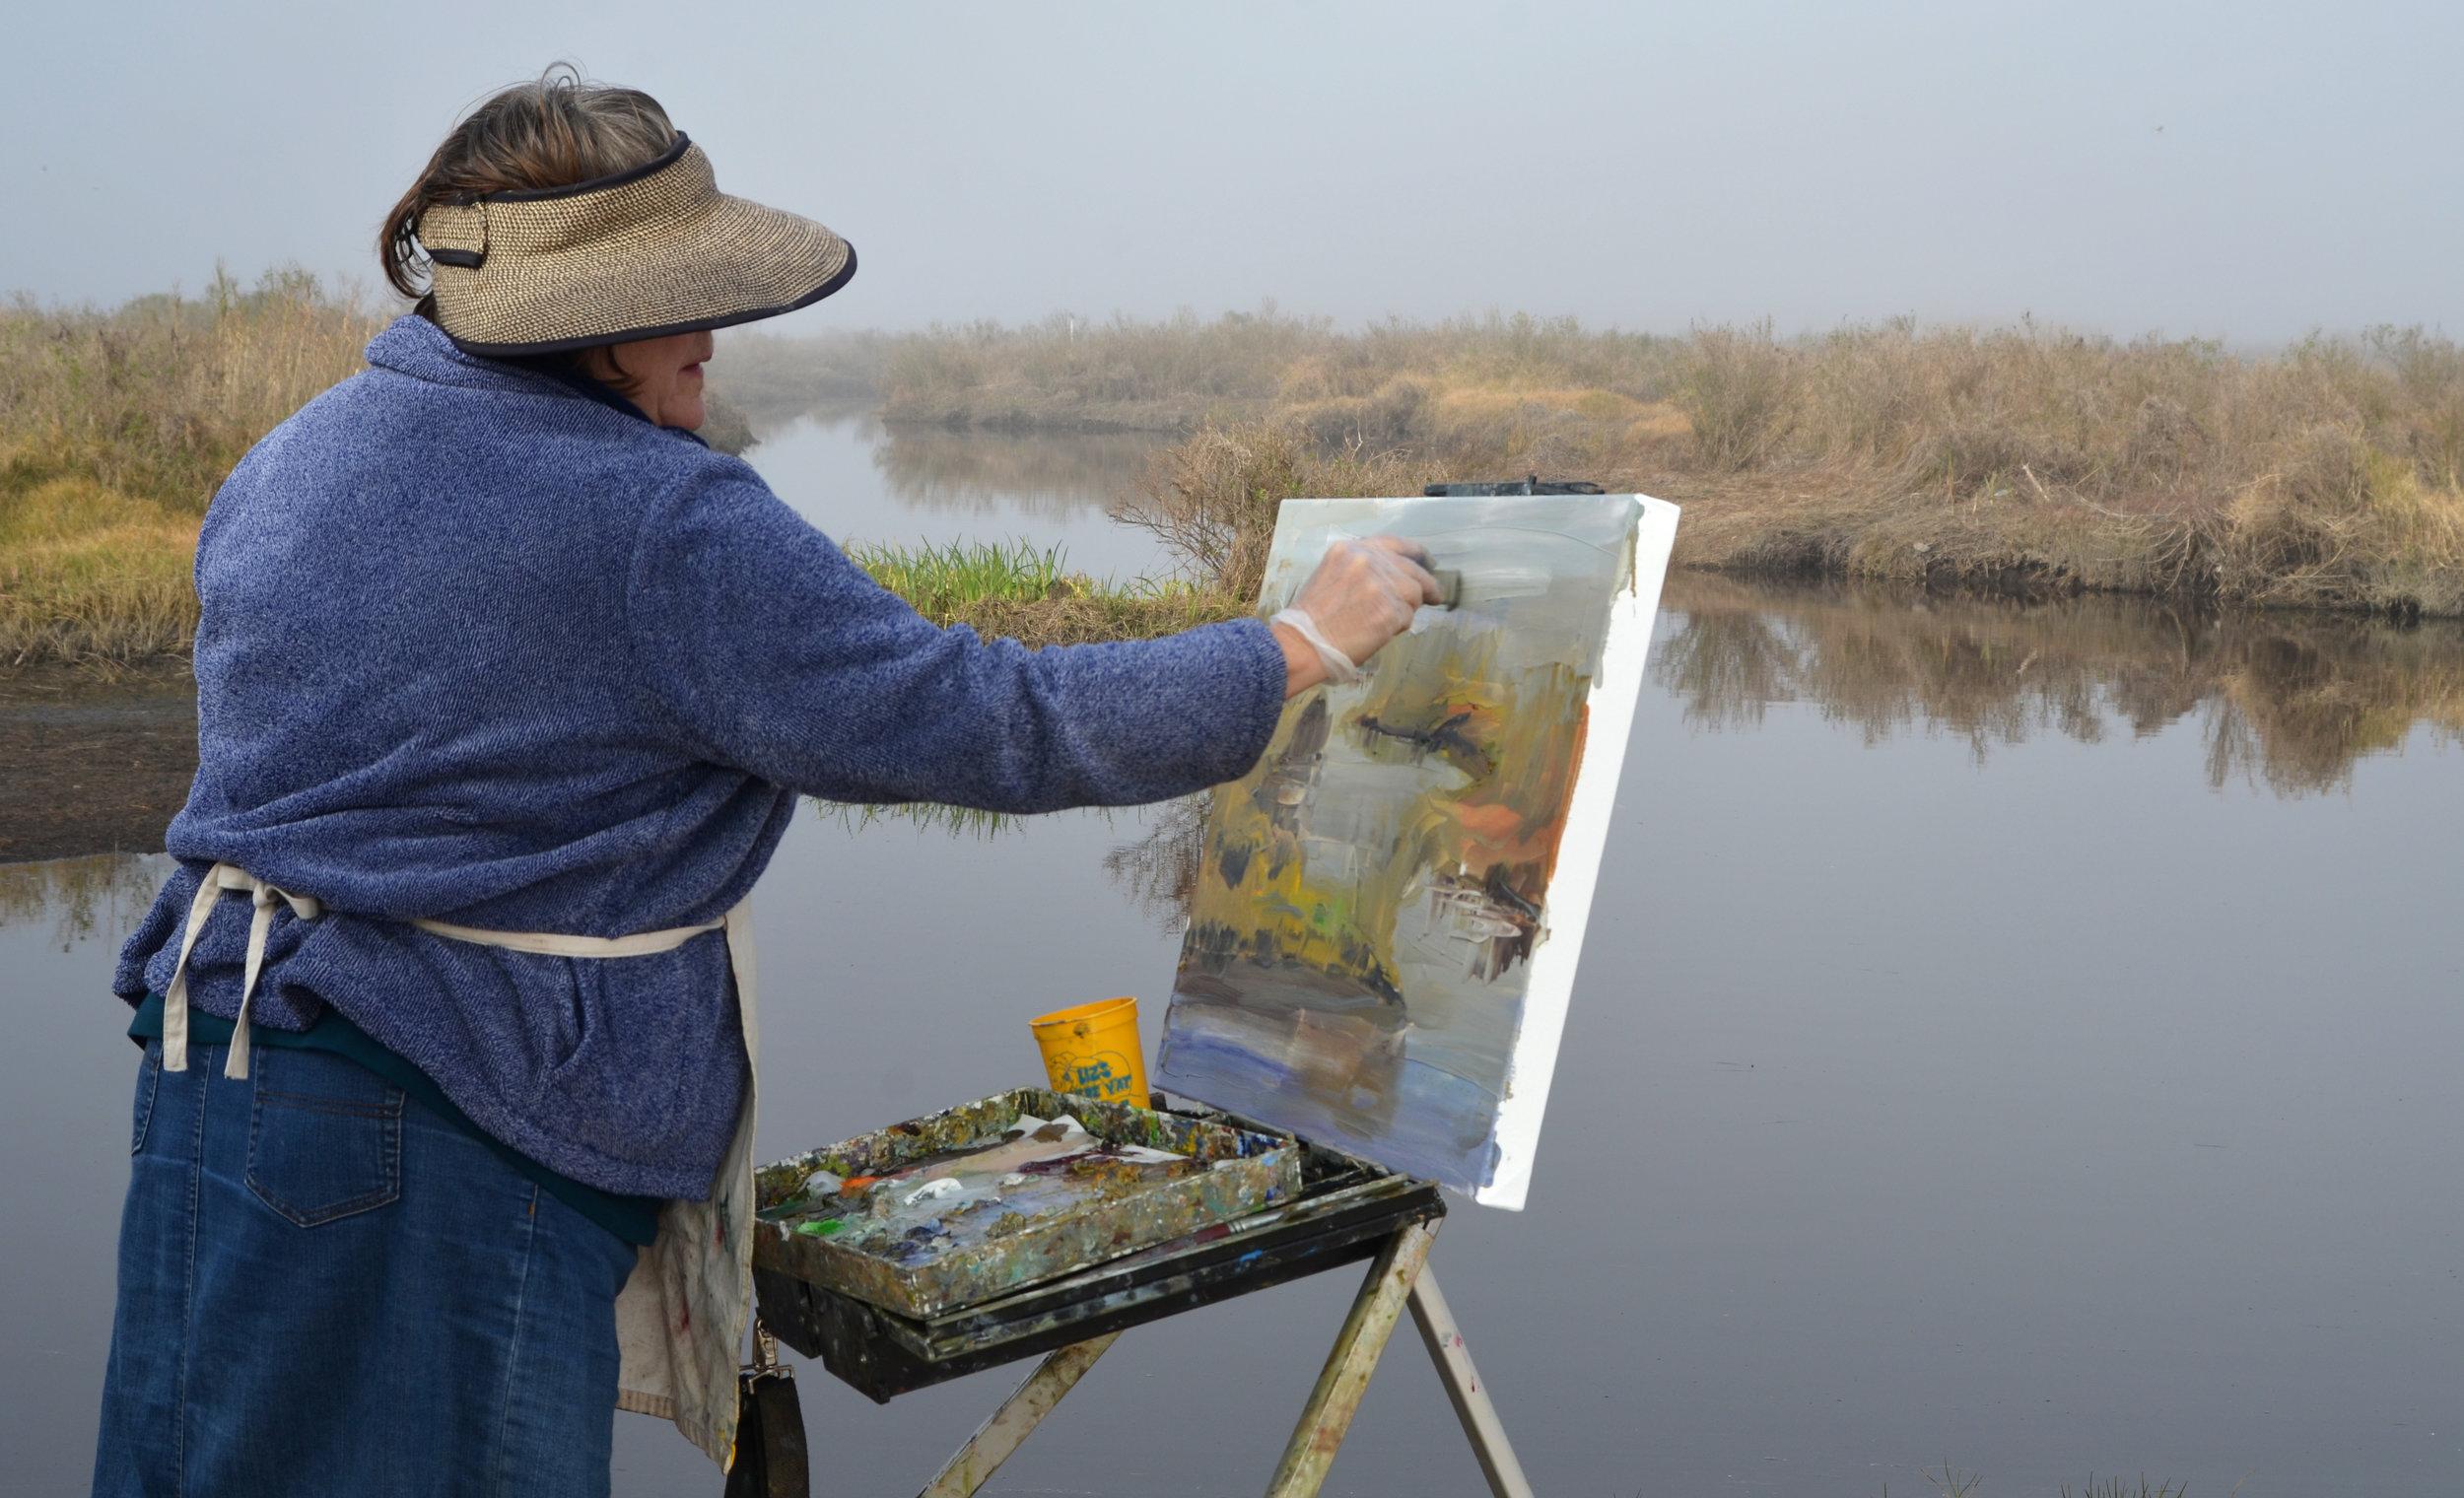 Carol Hallock working in the marsh, 2016